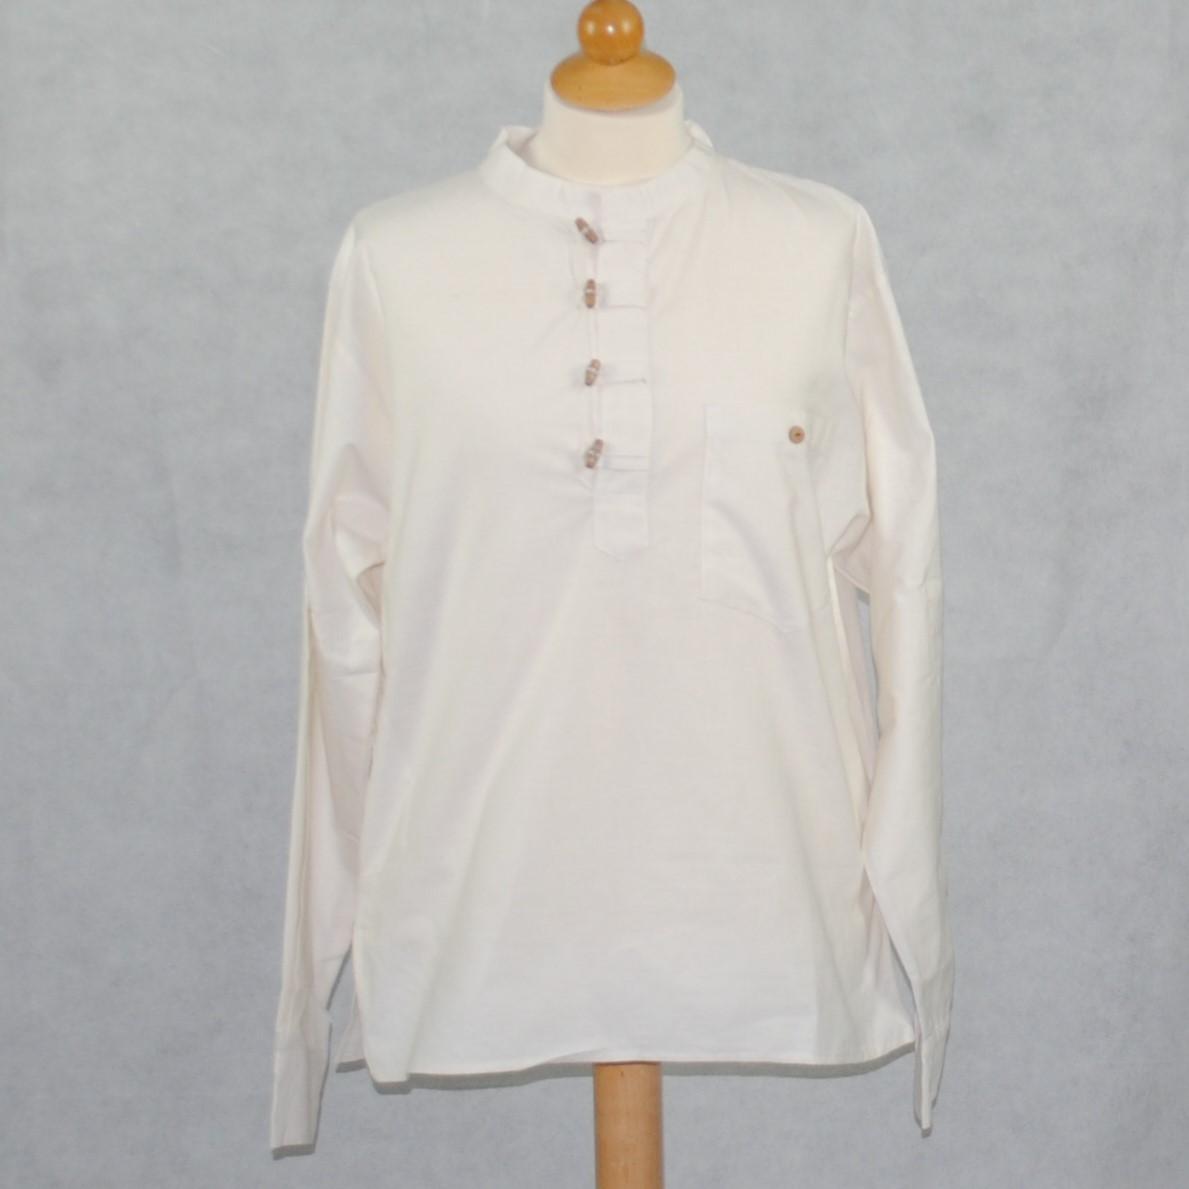 Wit Heren Overhemd.Heren Overhemd A01 Wit Pasal Himal